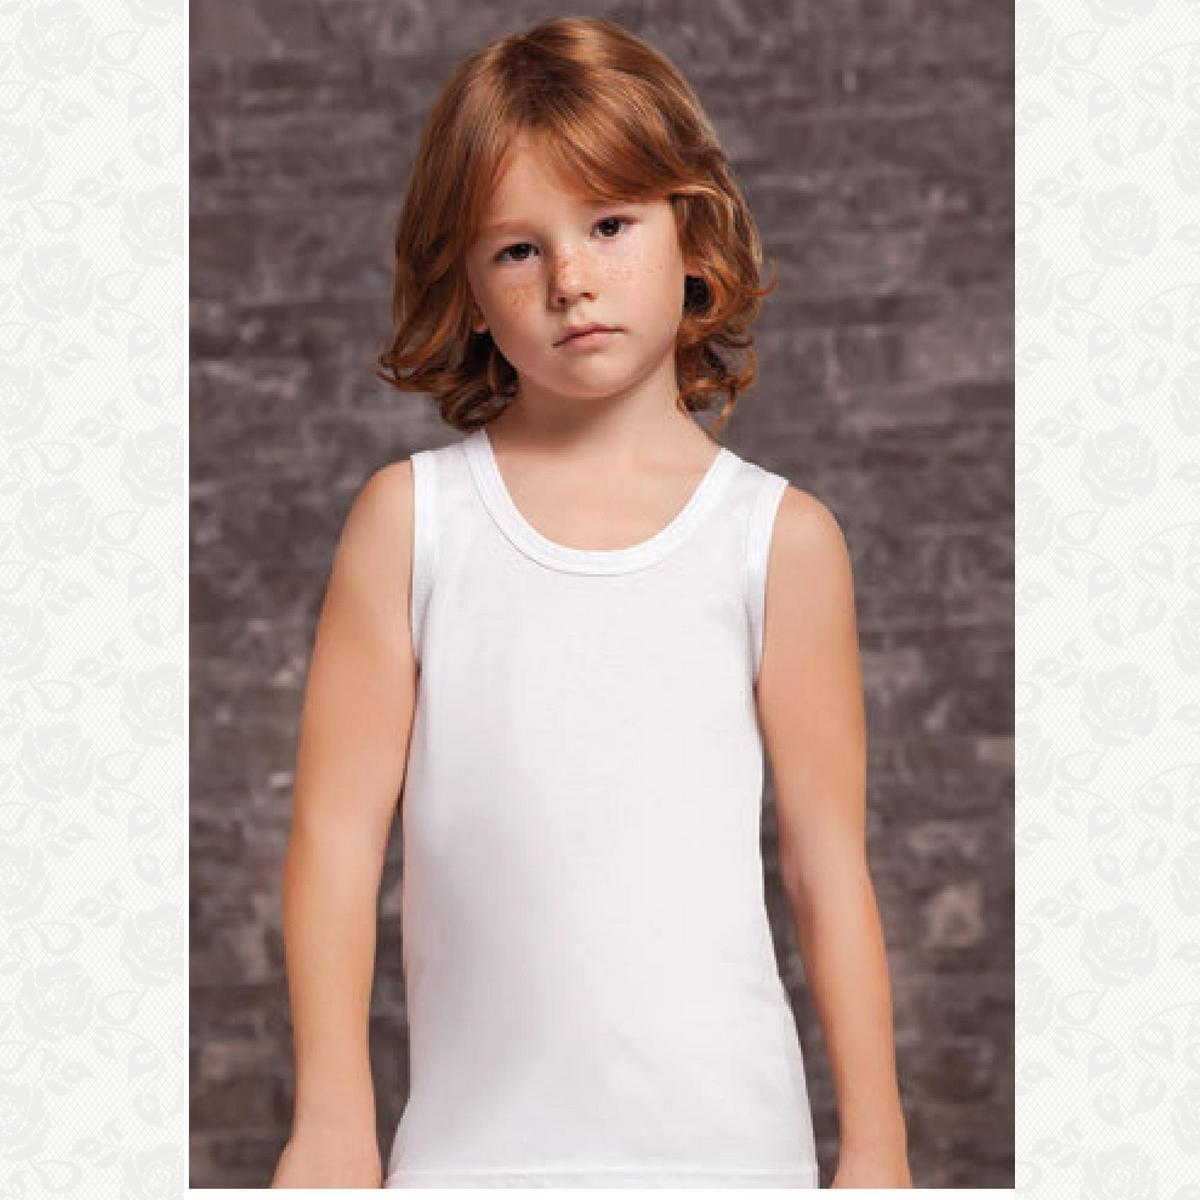 Майка для мальчика размер от 1 до 4, цвет белый, 6 шт.